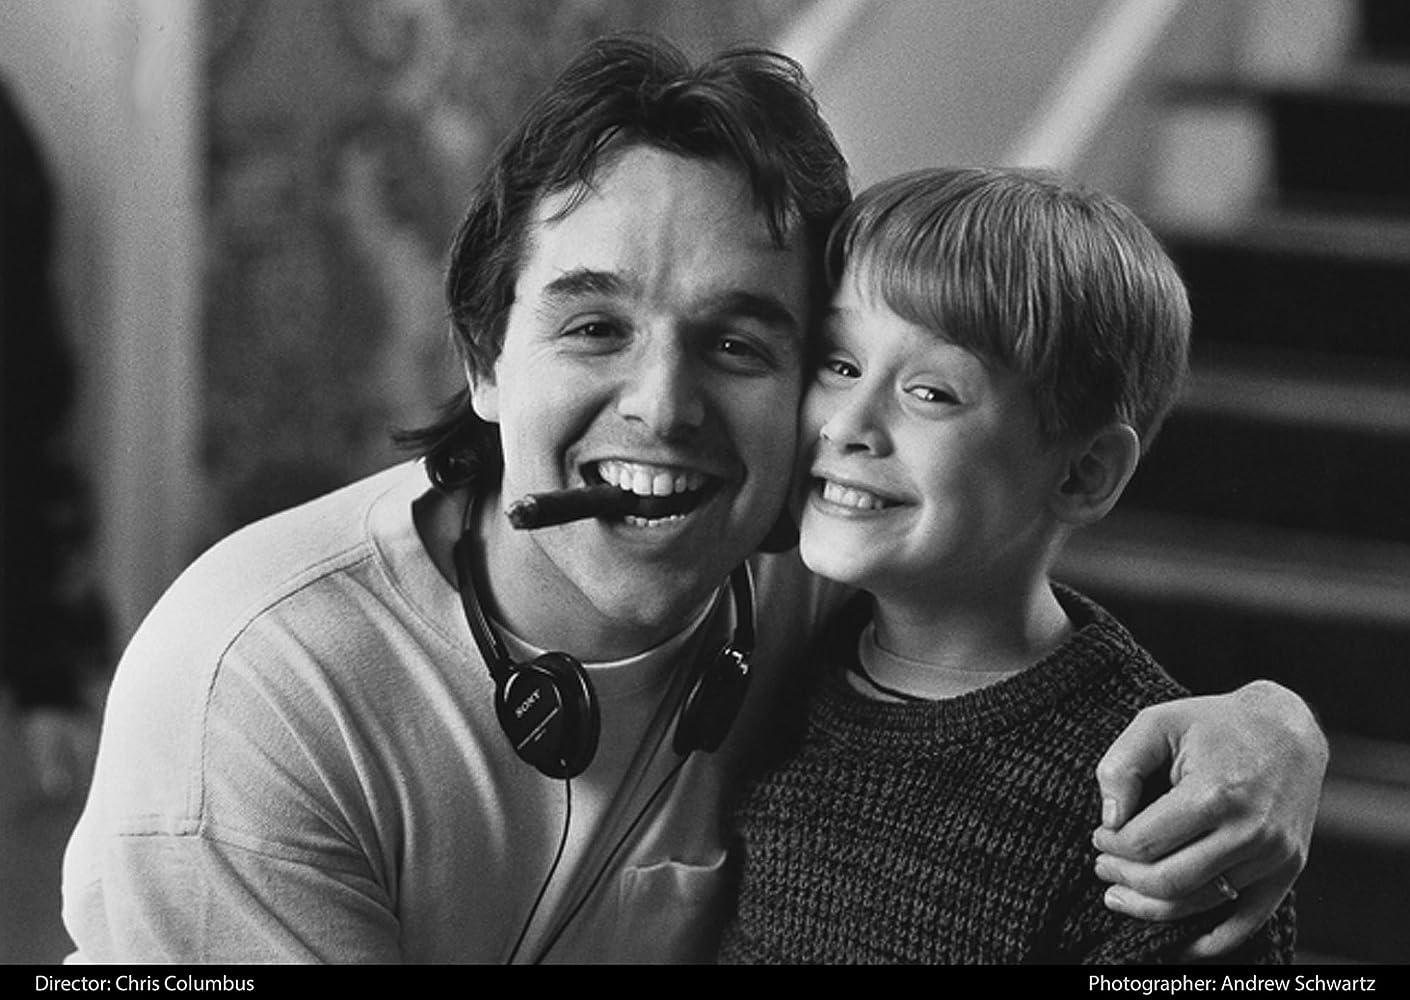 Macaulay Culkin and Chris Columbus in Home Alone 1990